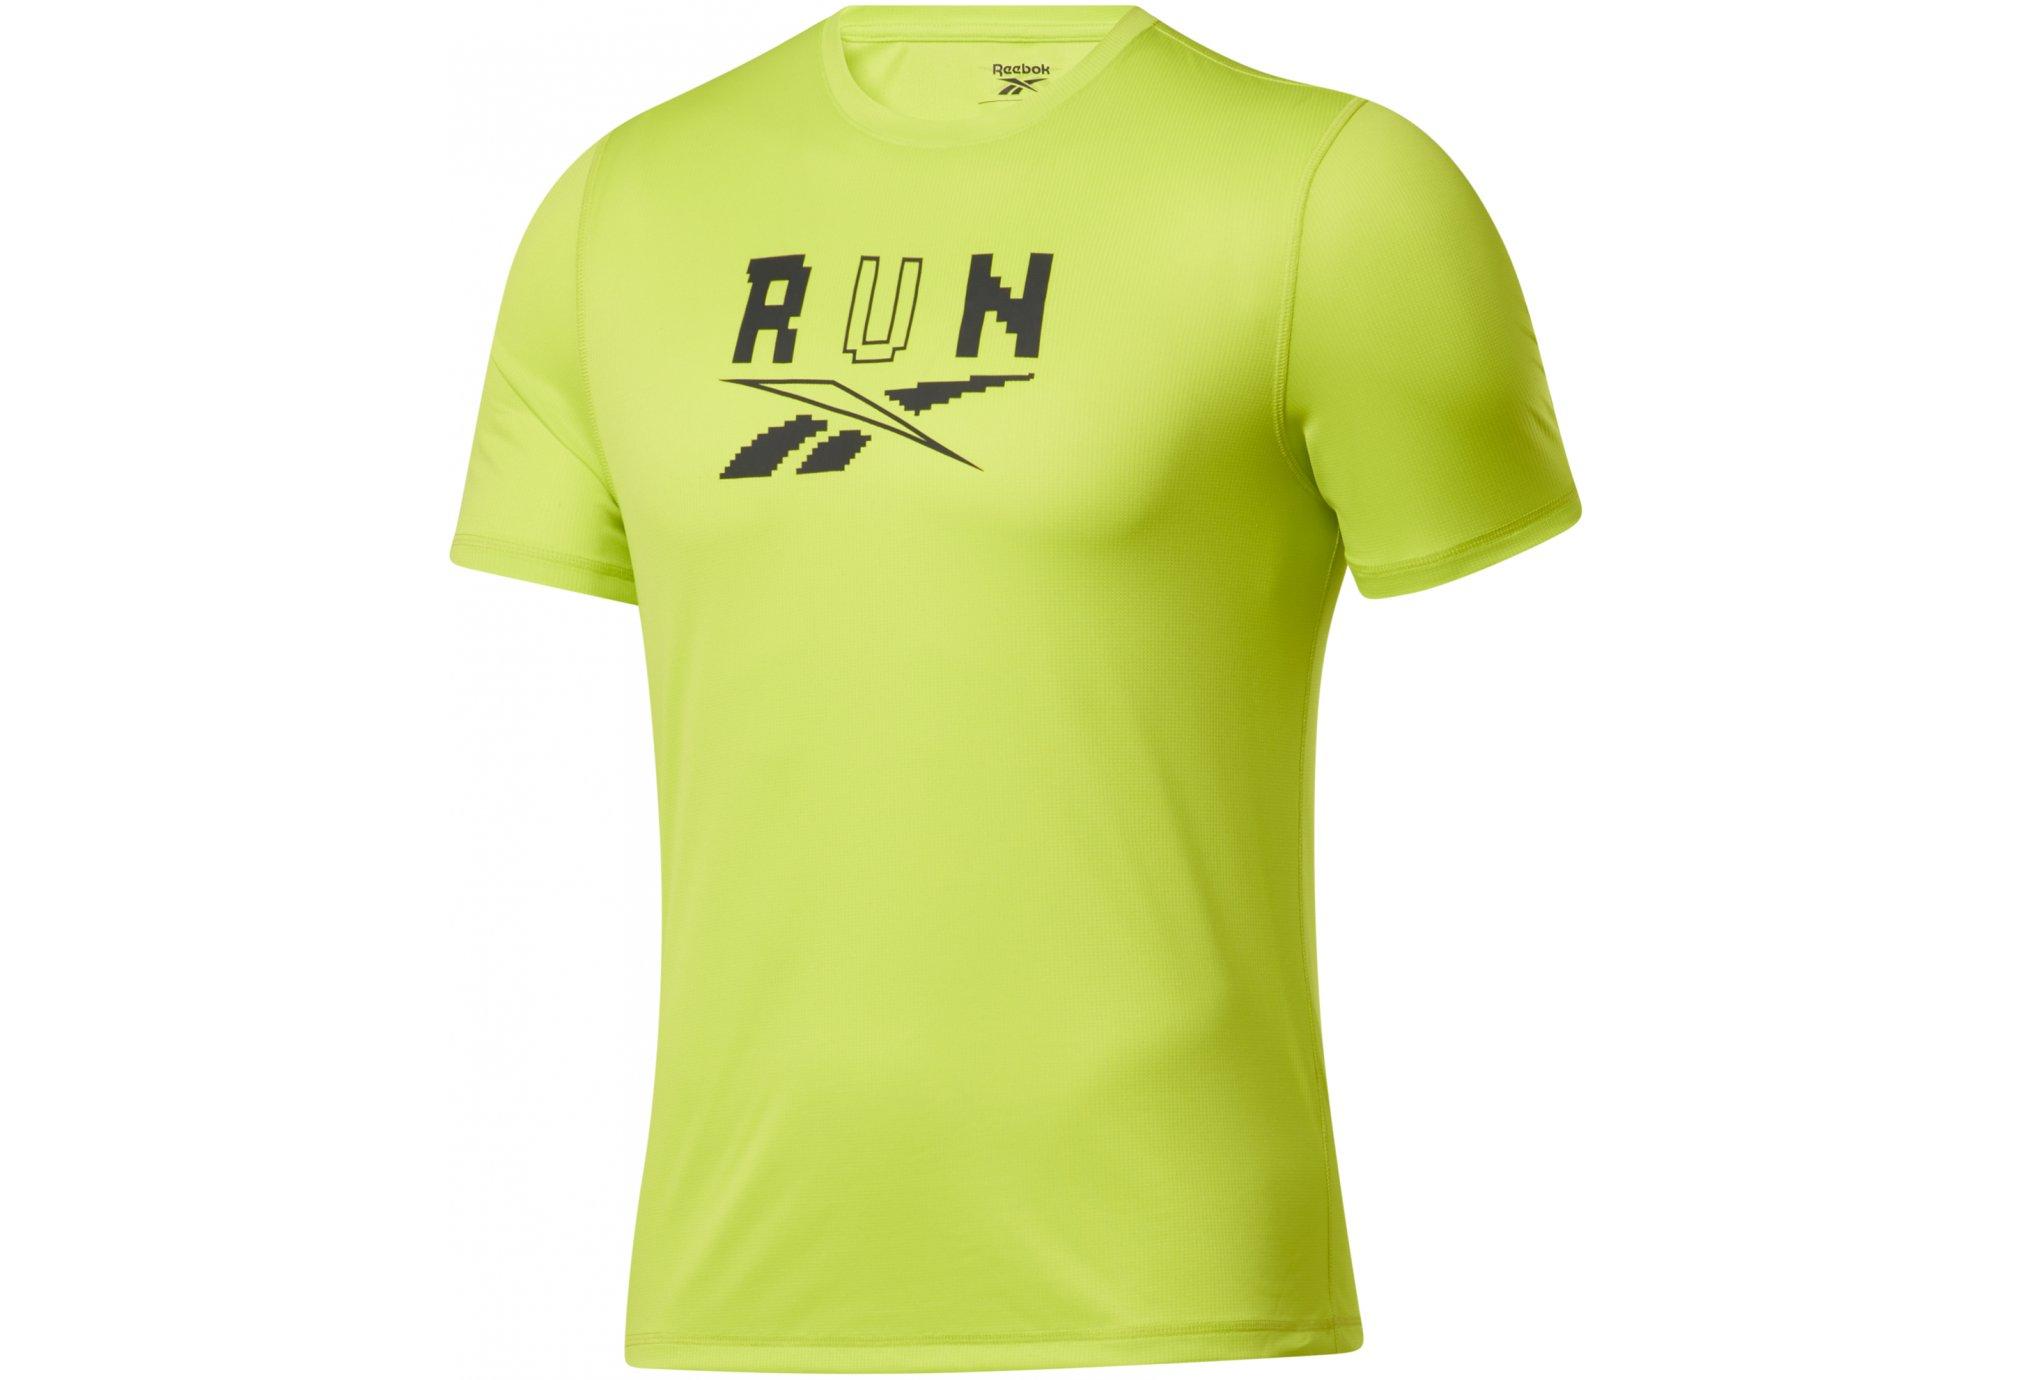 Reebok Speedwick Graphic M vêtement running homme